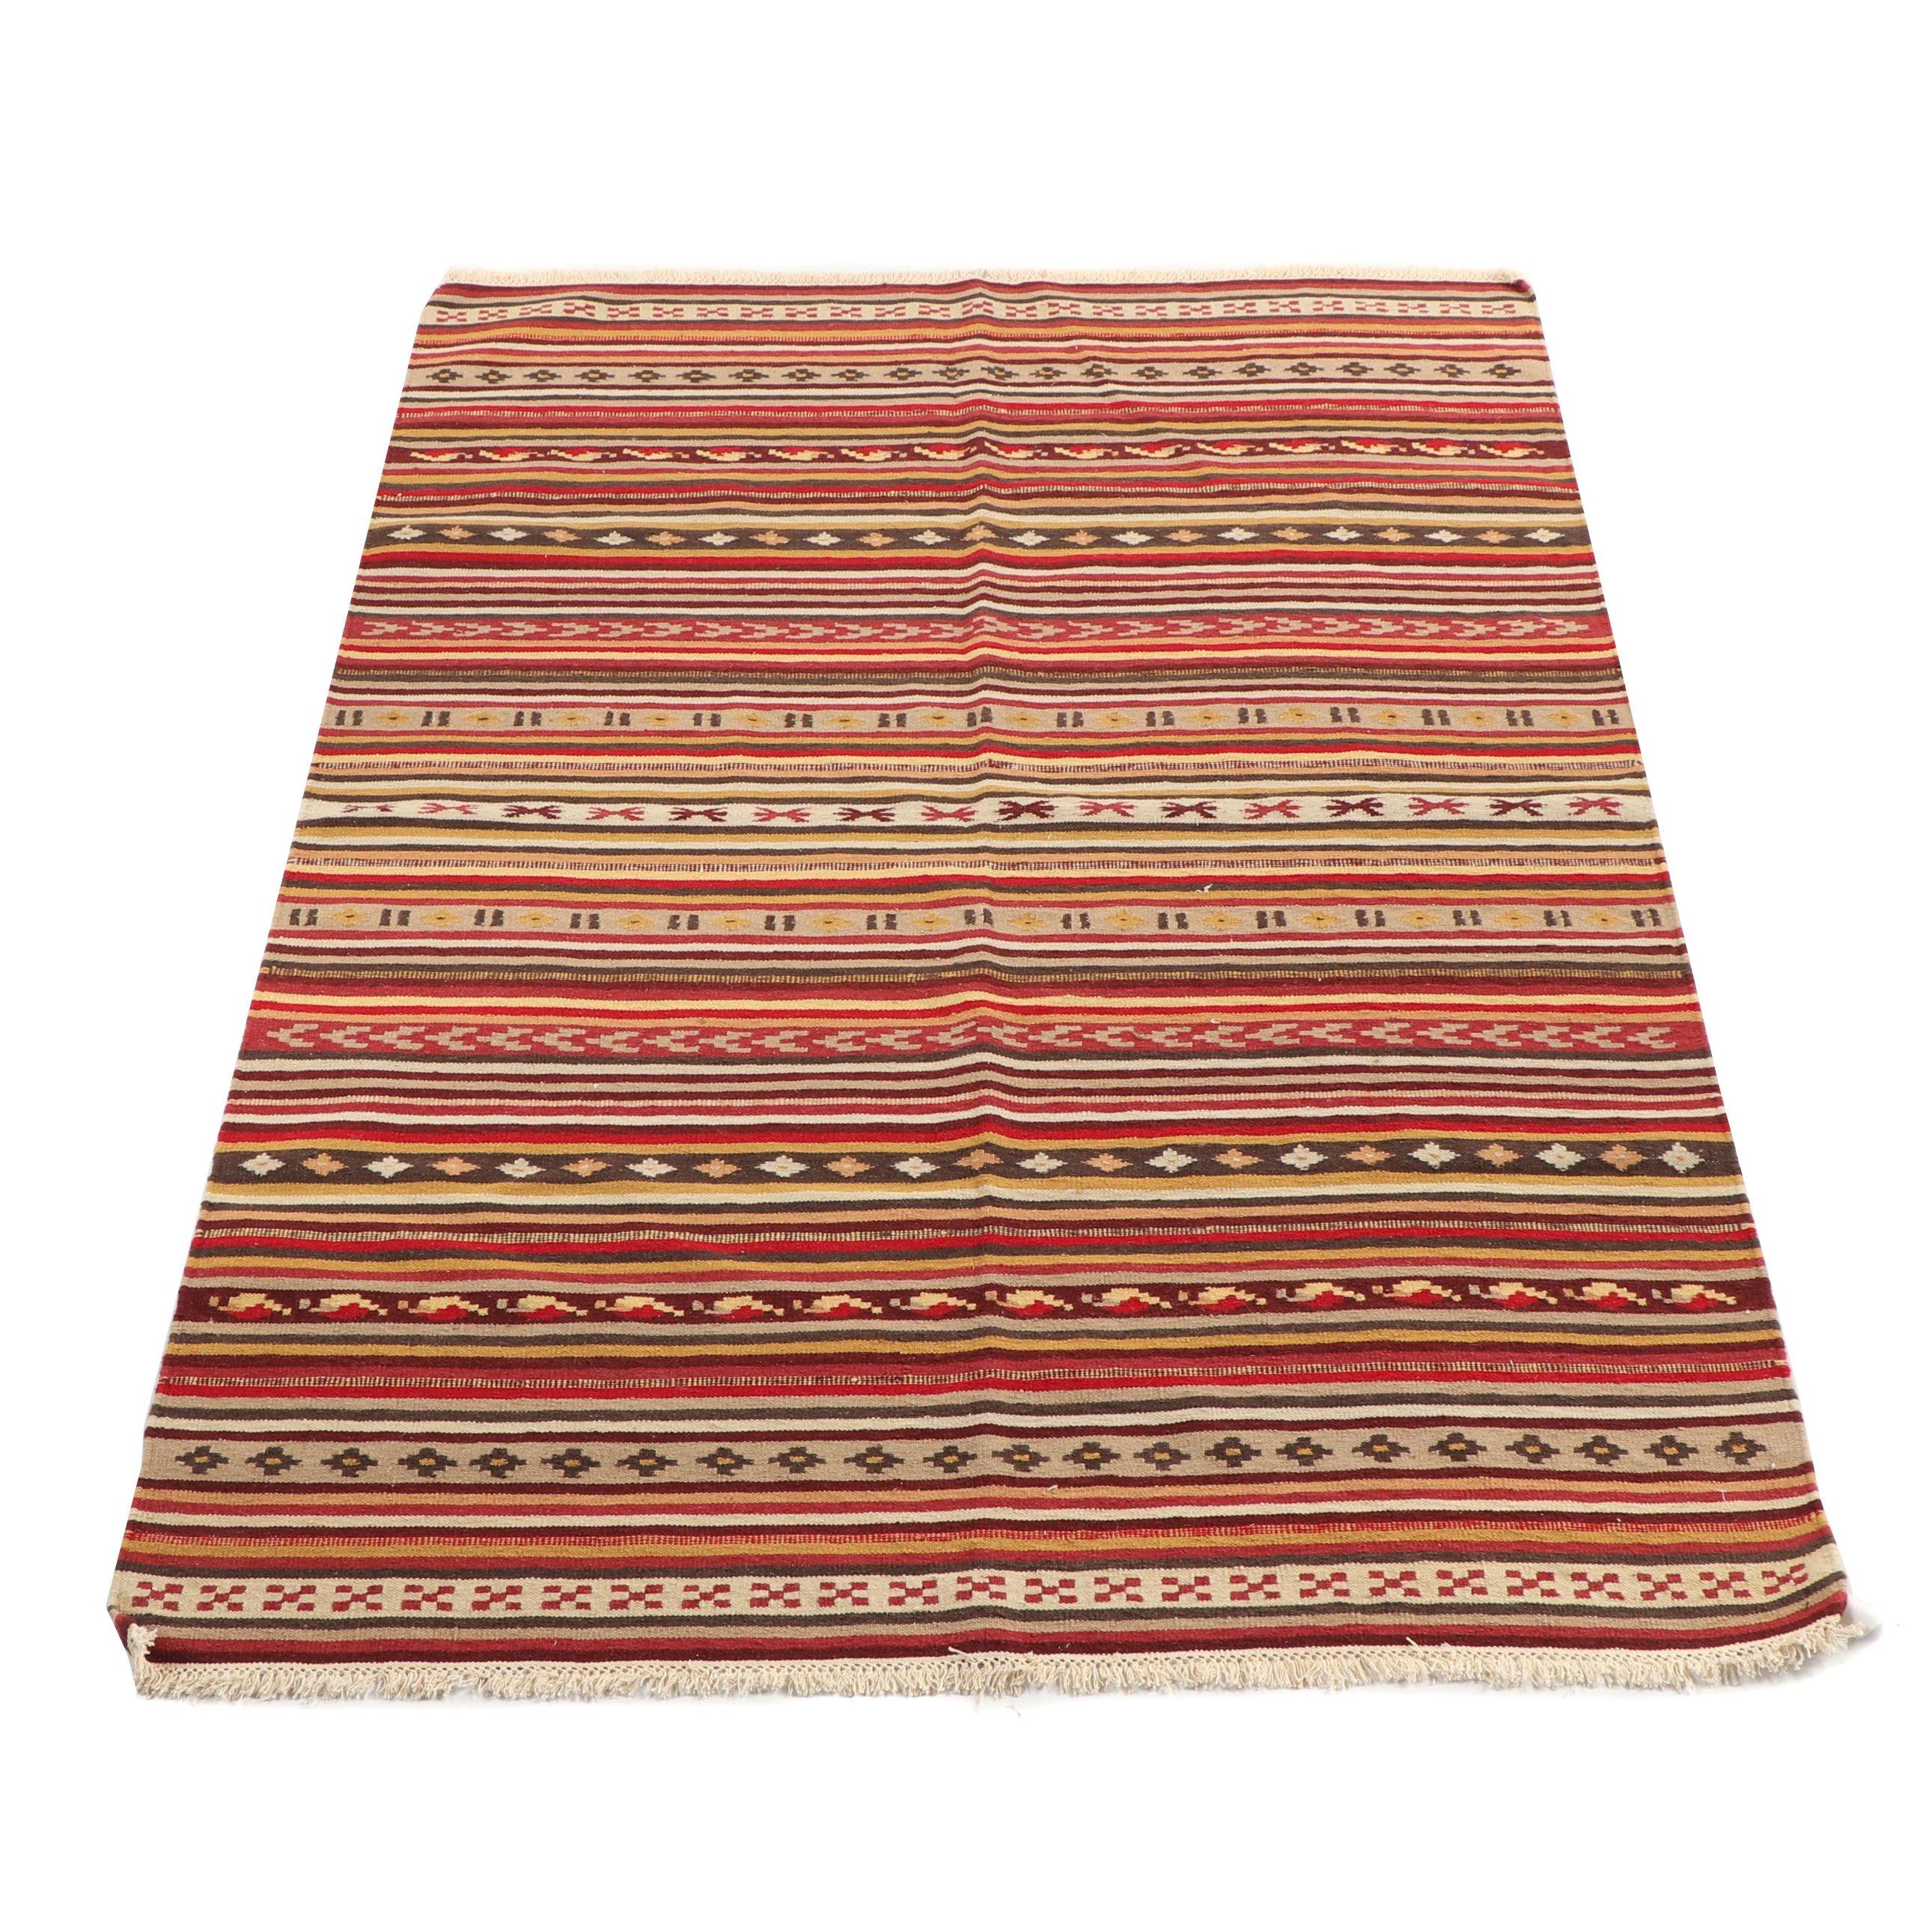 Handwoven Moroccan Wool Kilim